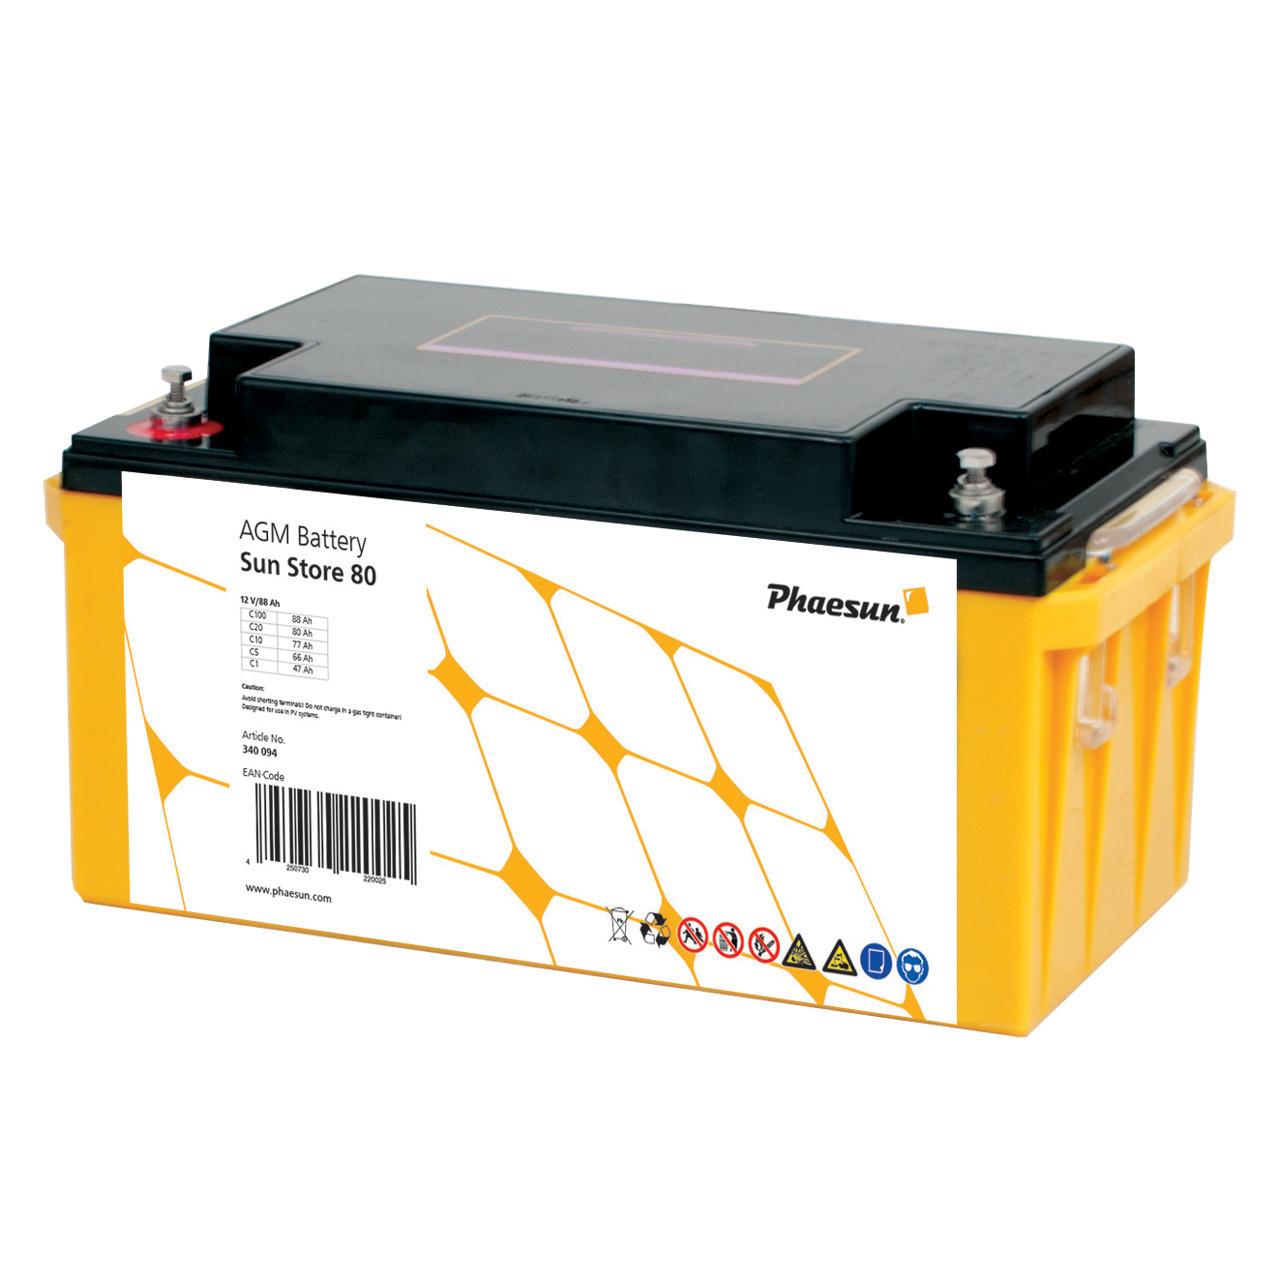 Phaesun Blei-AGM-Akku Sun Store 80- 12 V- 90 Ah